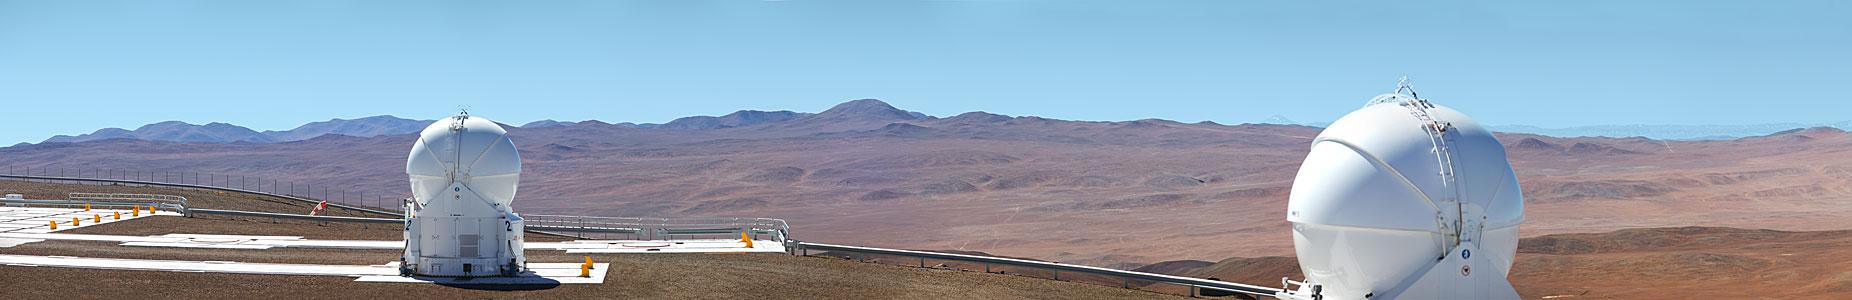 ESO Very Large Telescope array